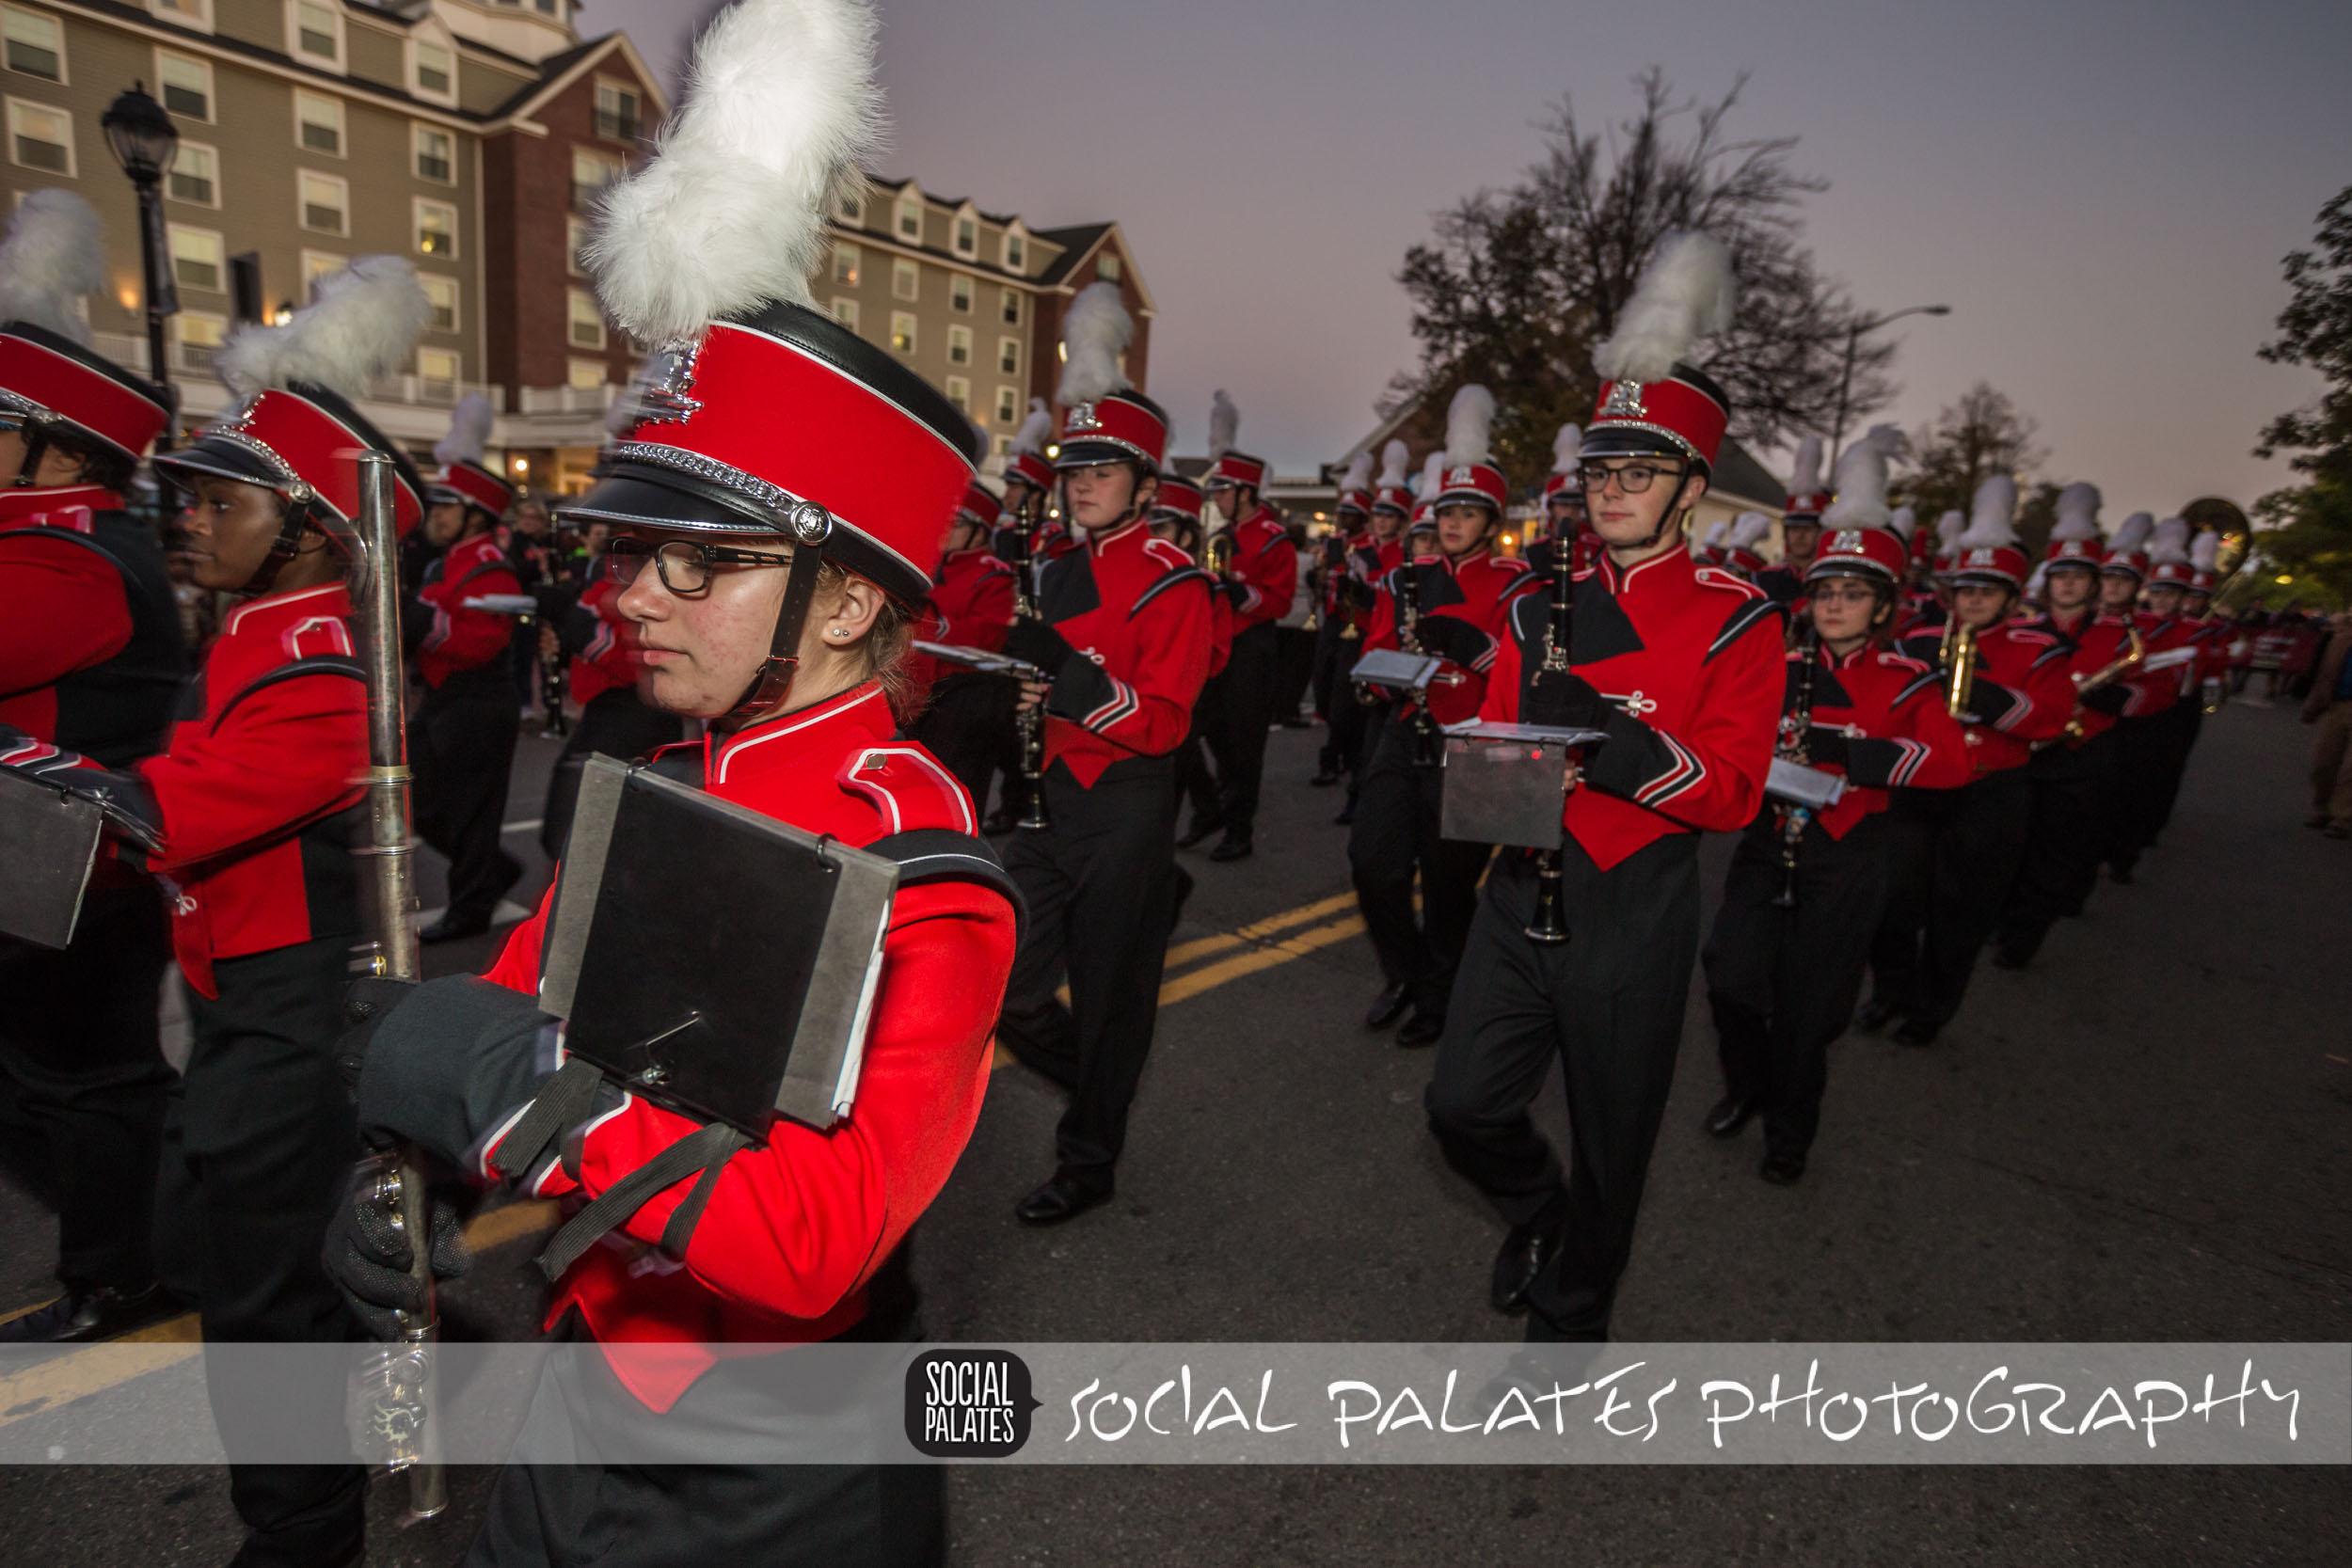 Haunted Happenings Parade 2014 Creative Salem by Social Palates-7309.jpg